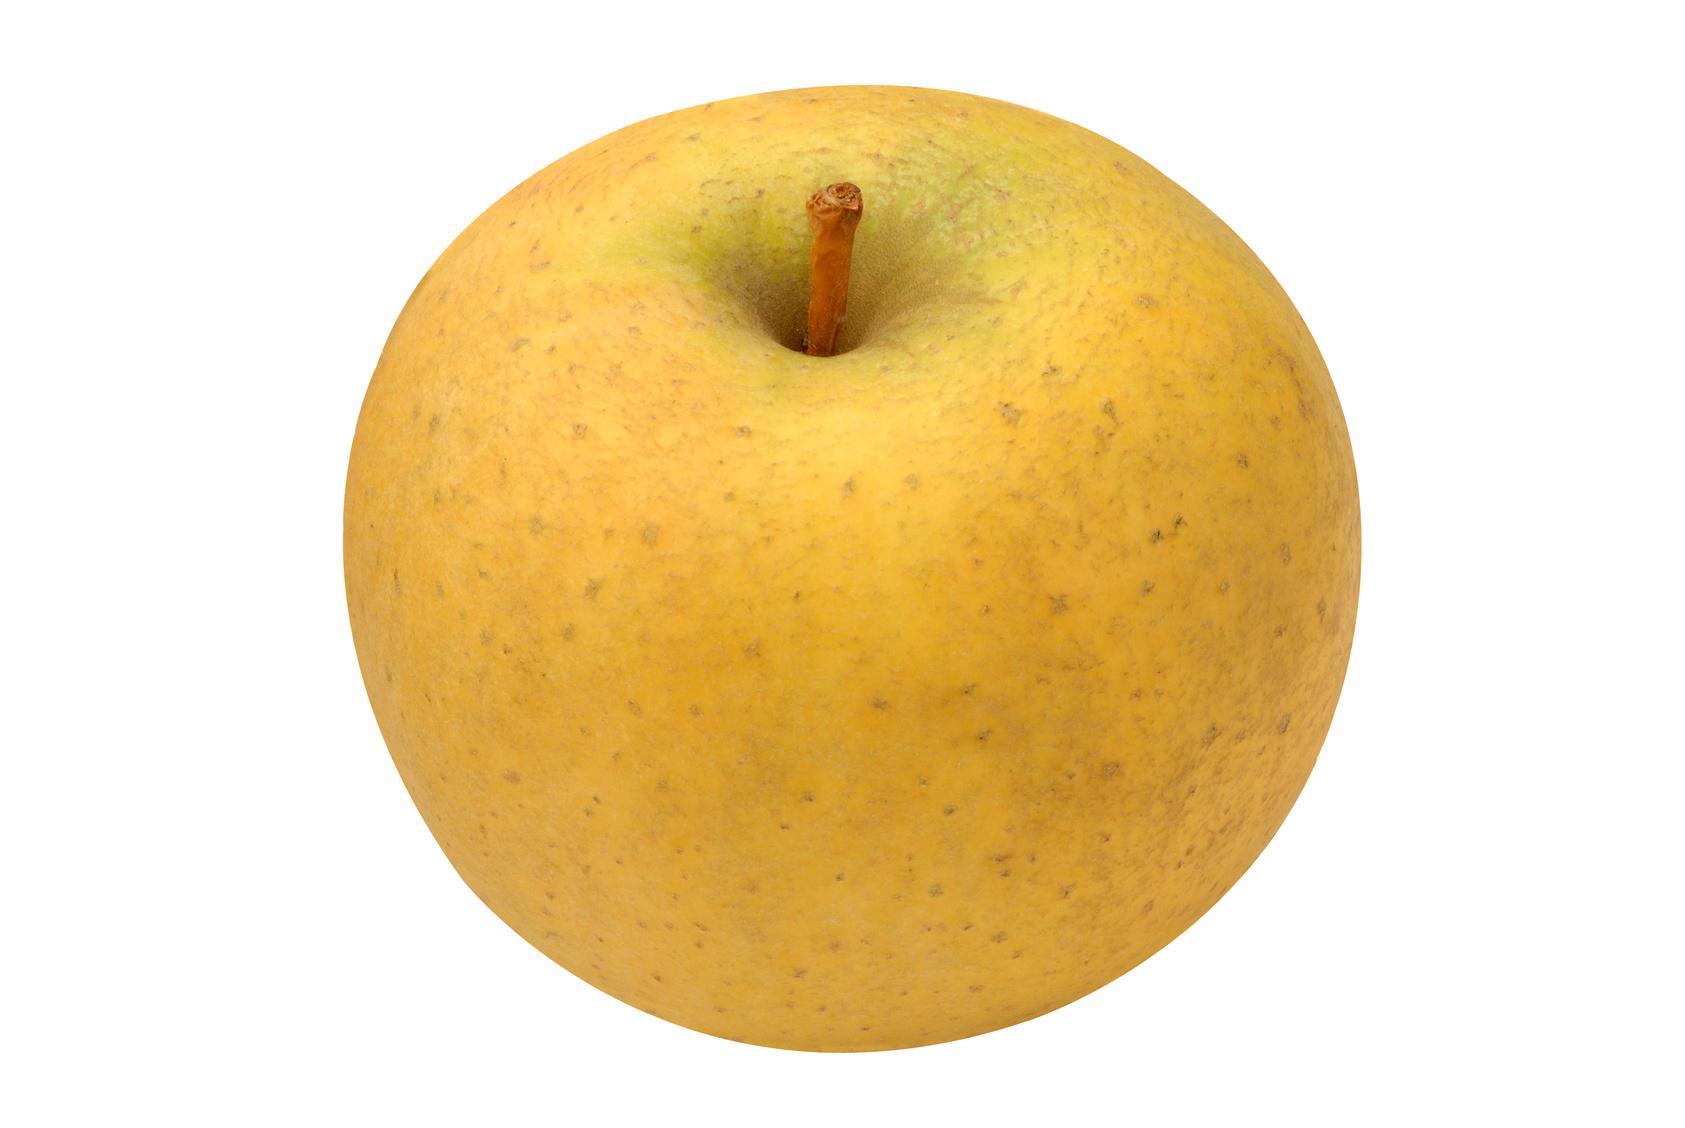 Pomme jaune Belchard - Chanteclerc Fr BIO